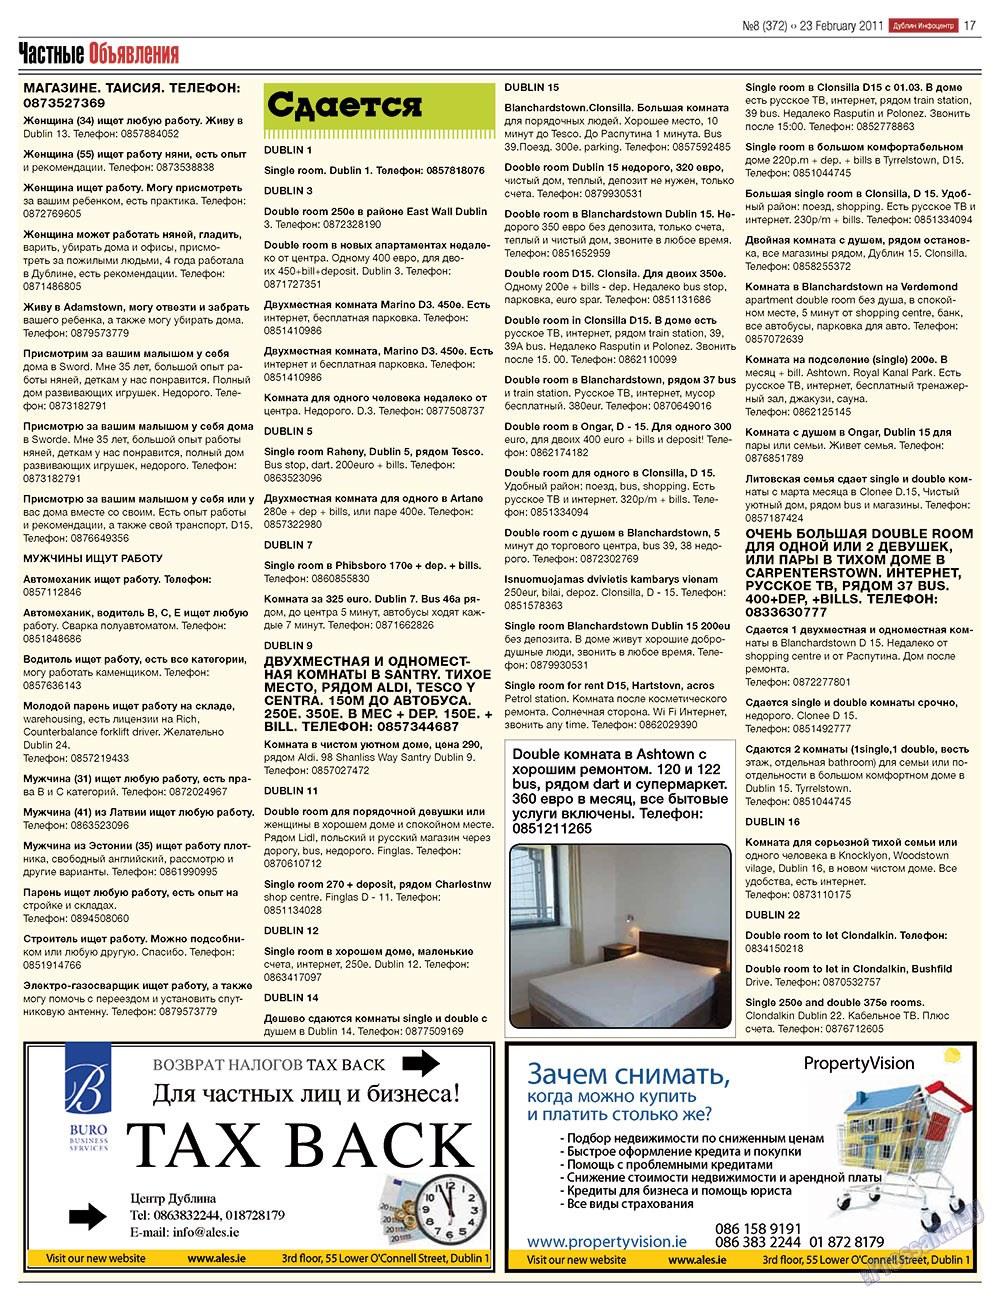 Дублин инфоцентр (газета). 2011 год, номер 8, стр. 17